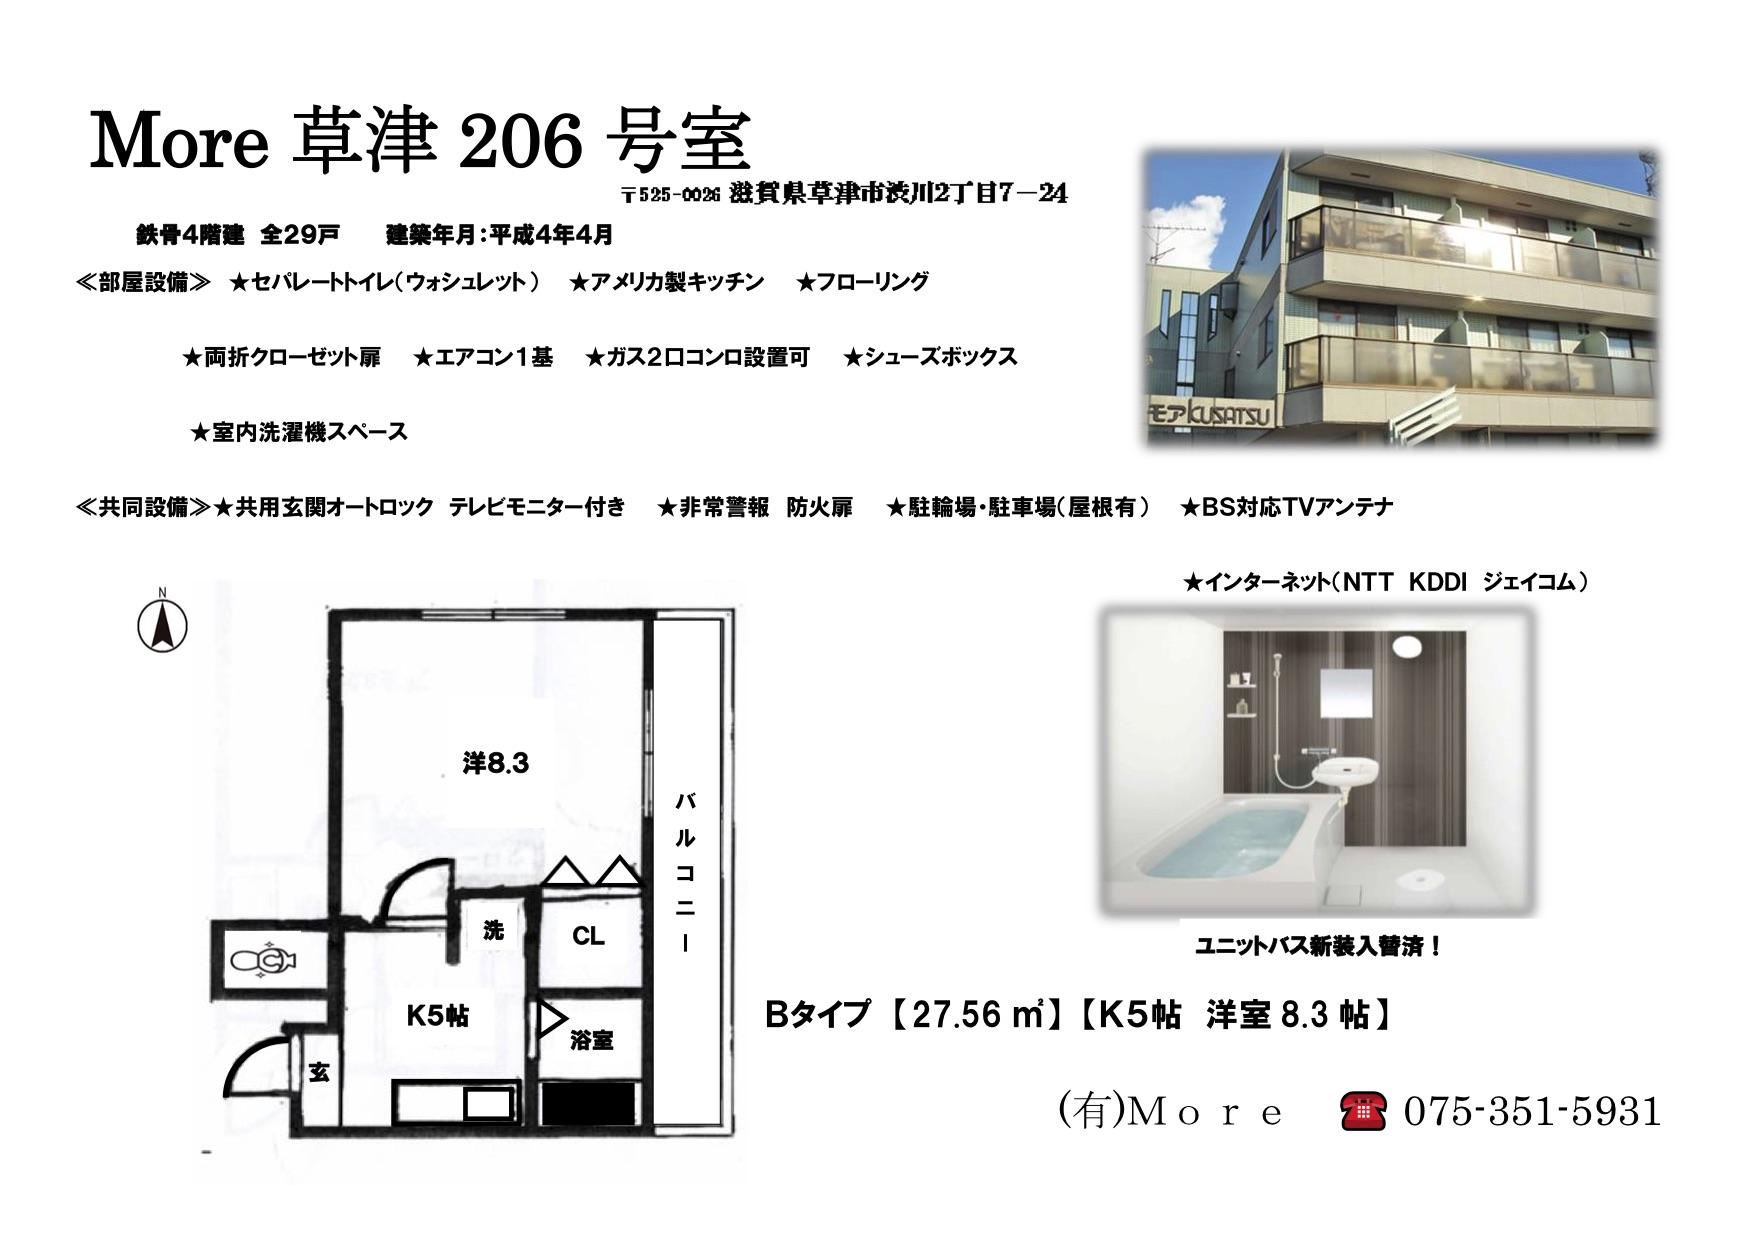 More草津 206号室